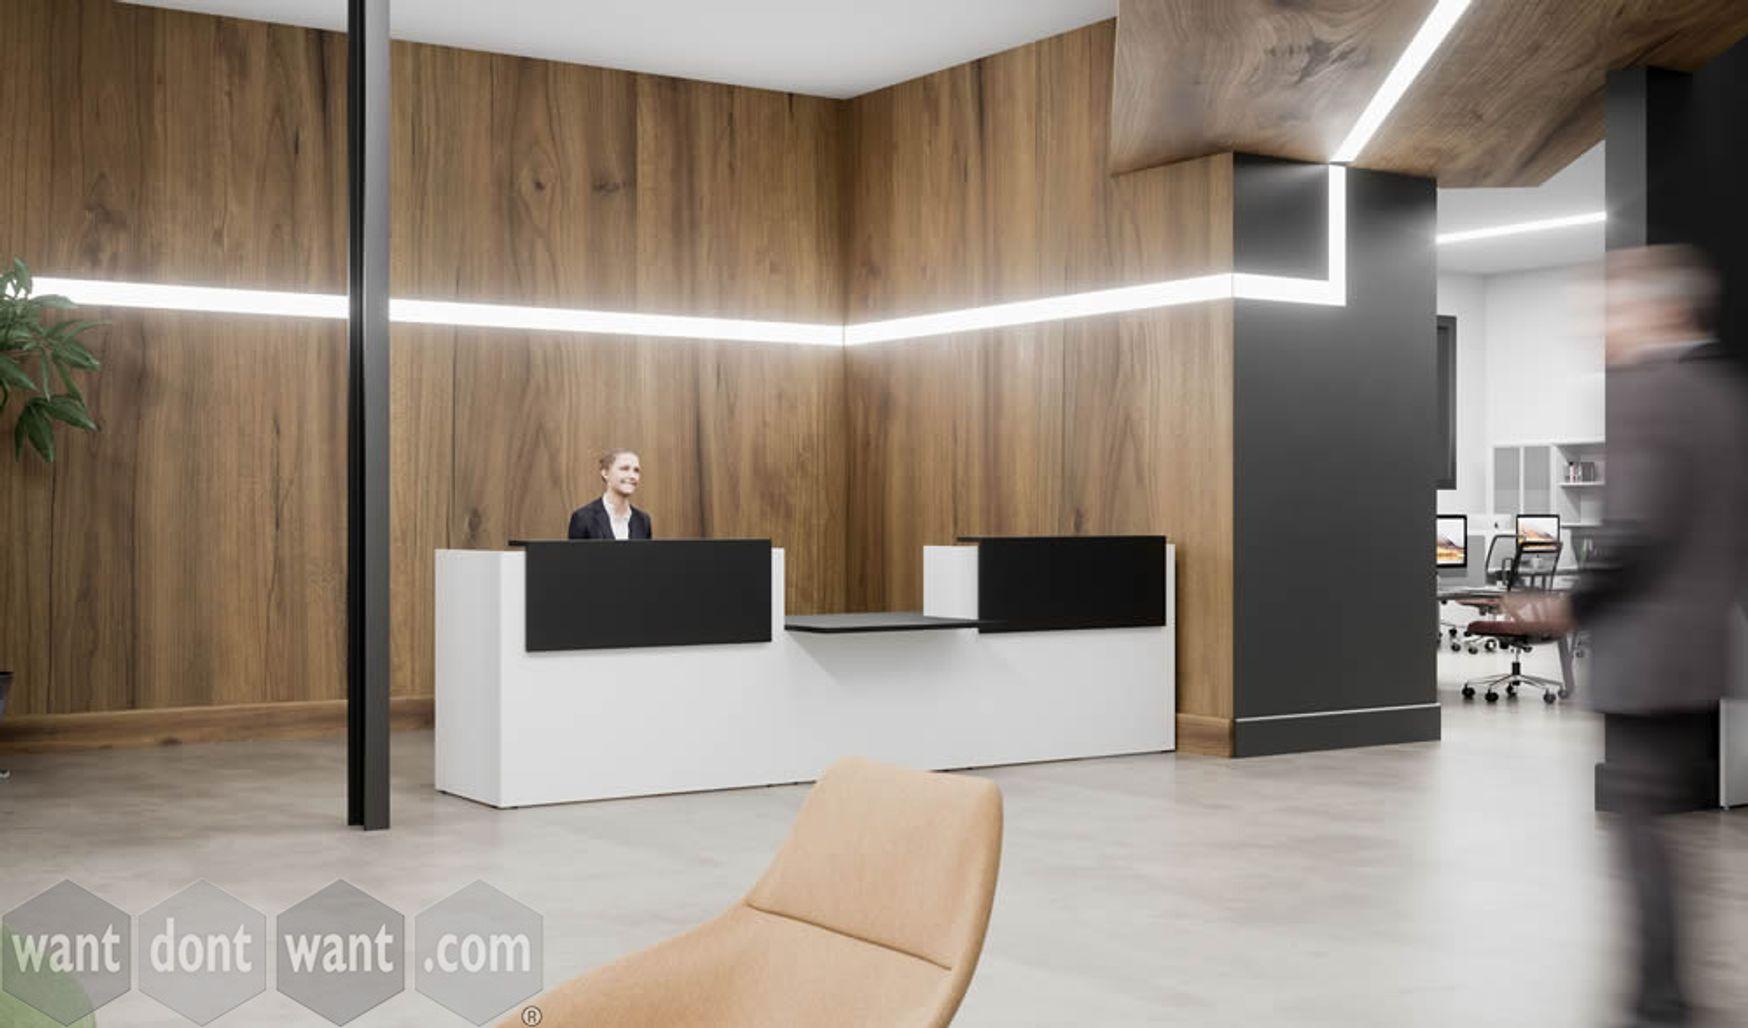 Brand New smart professional reception desk with central DDA